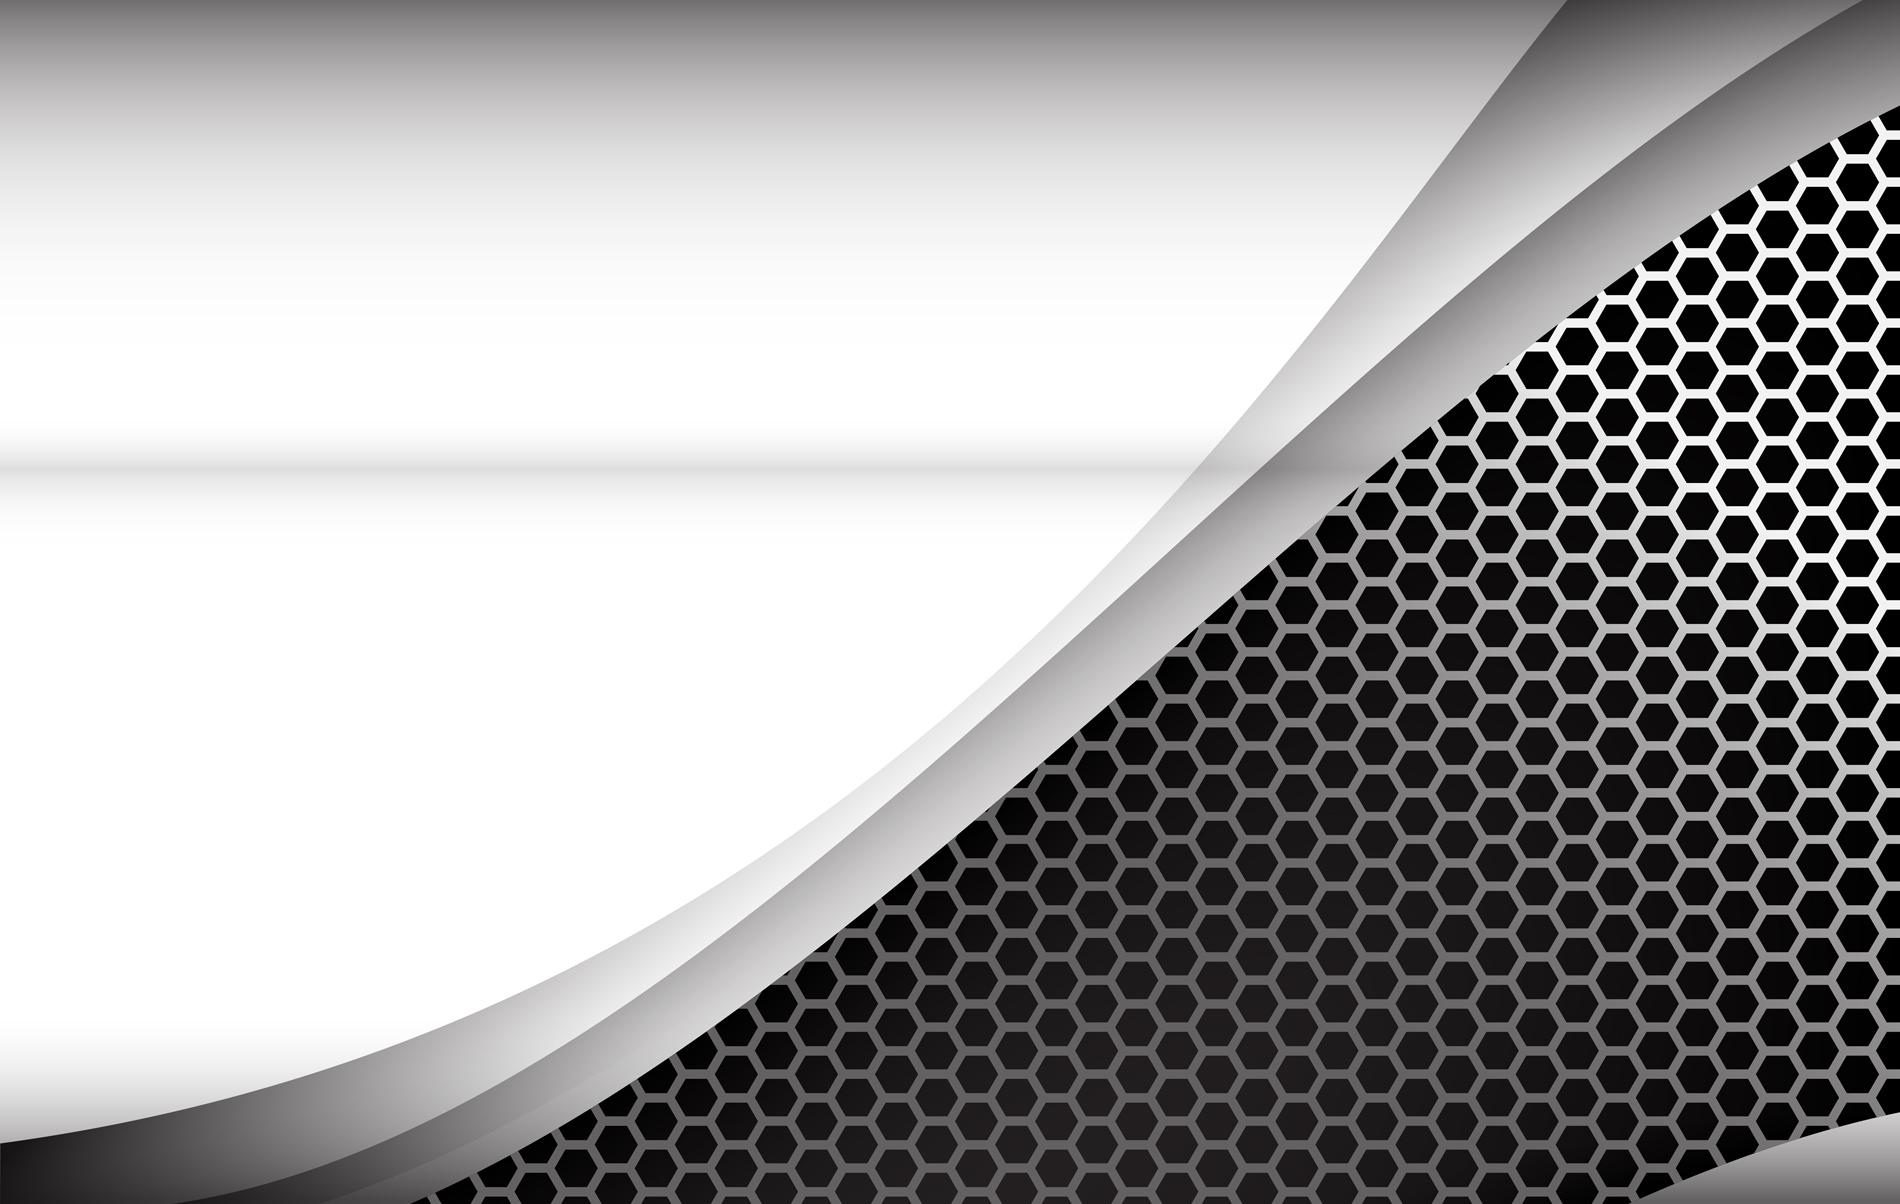 Metallic-steel-and-honeycomb-element-background-texture-003